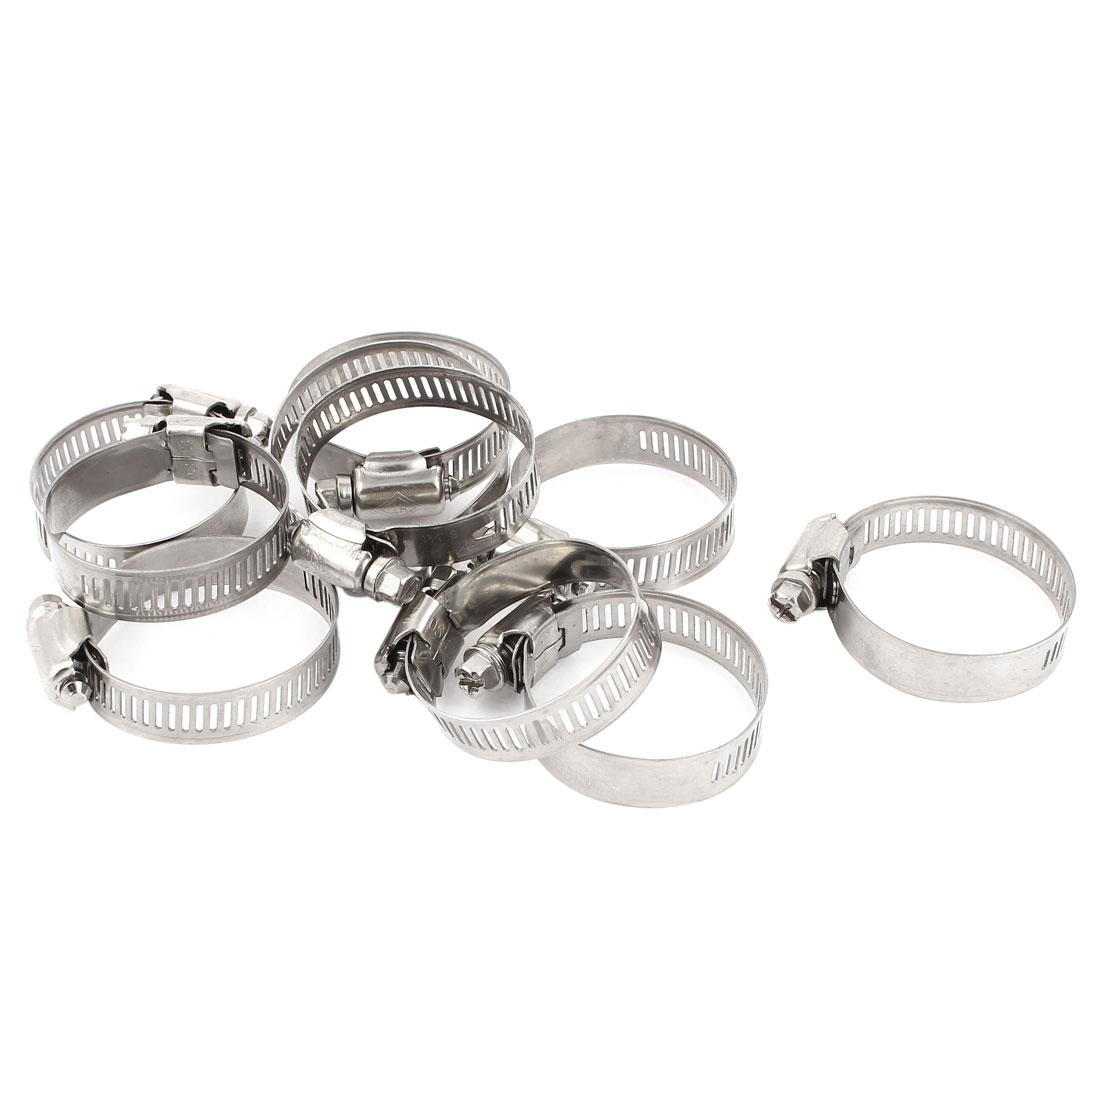 10 Pcs Stainless Steel Adjustable Pipe Hose Clamp Hoop 21-44mm